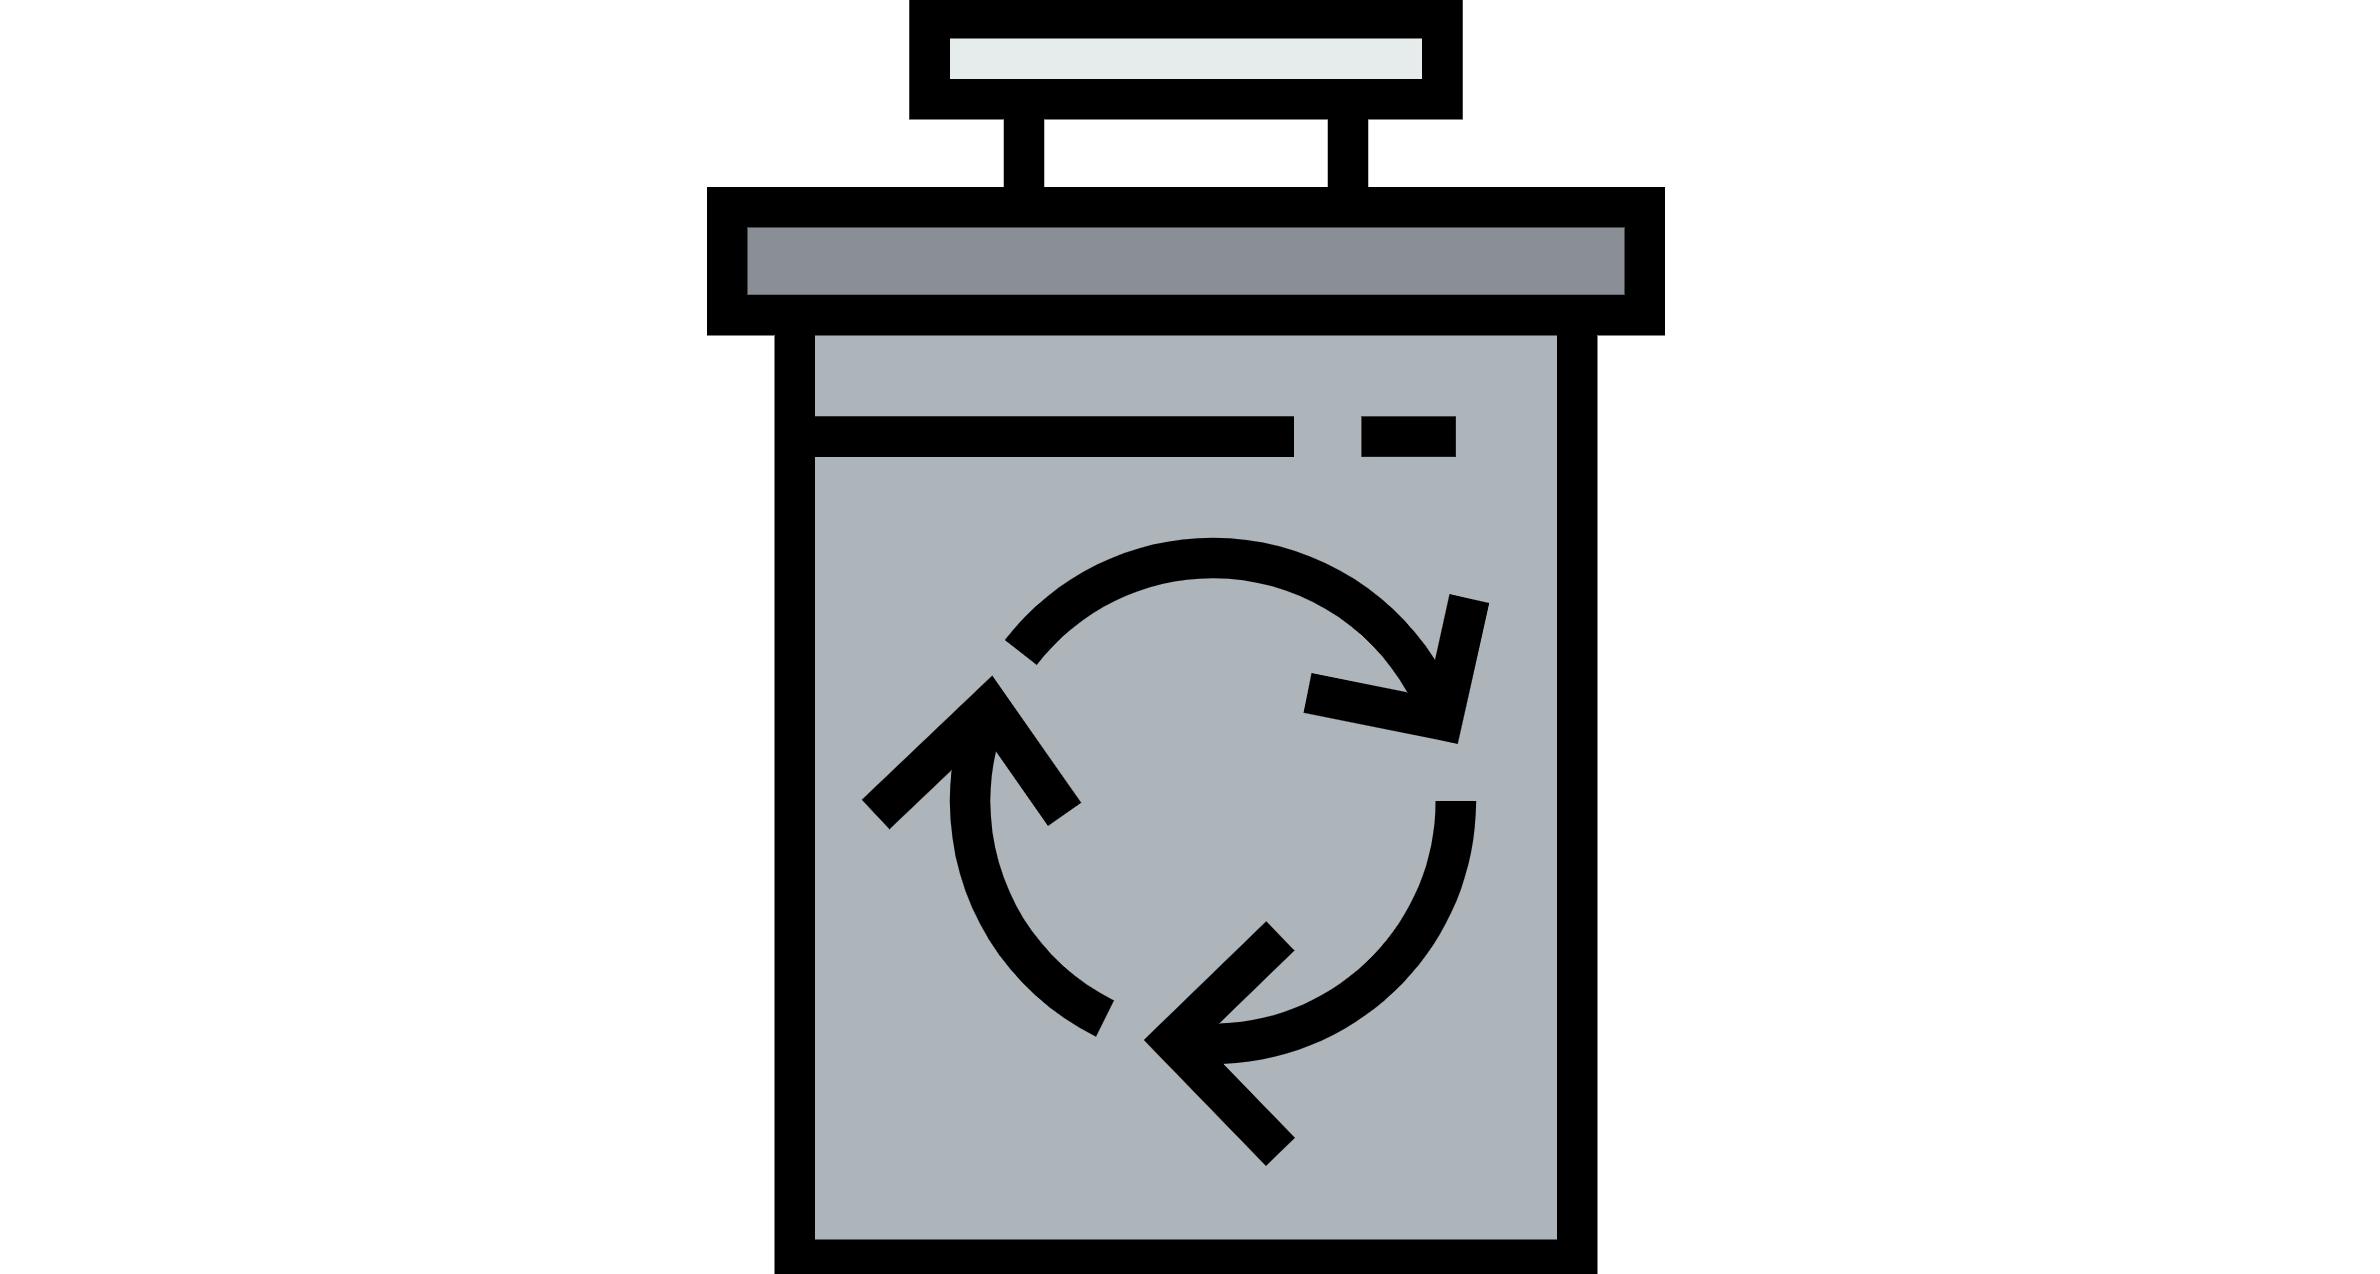 www.directv.com/recycle